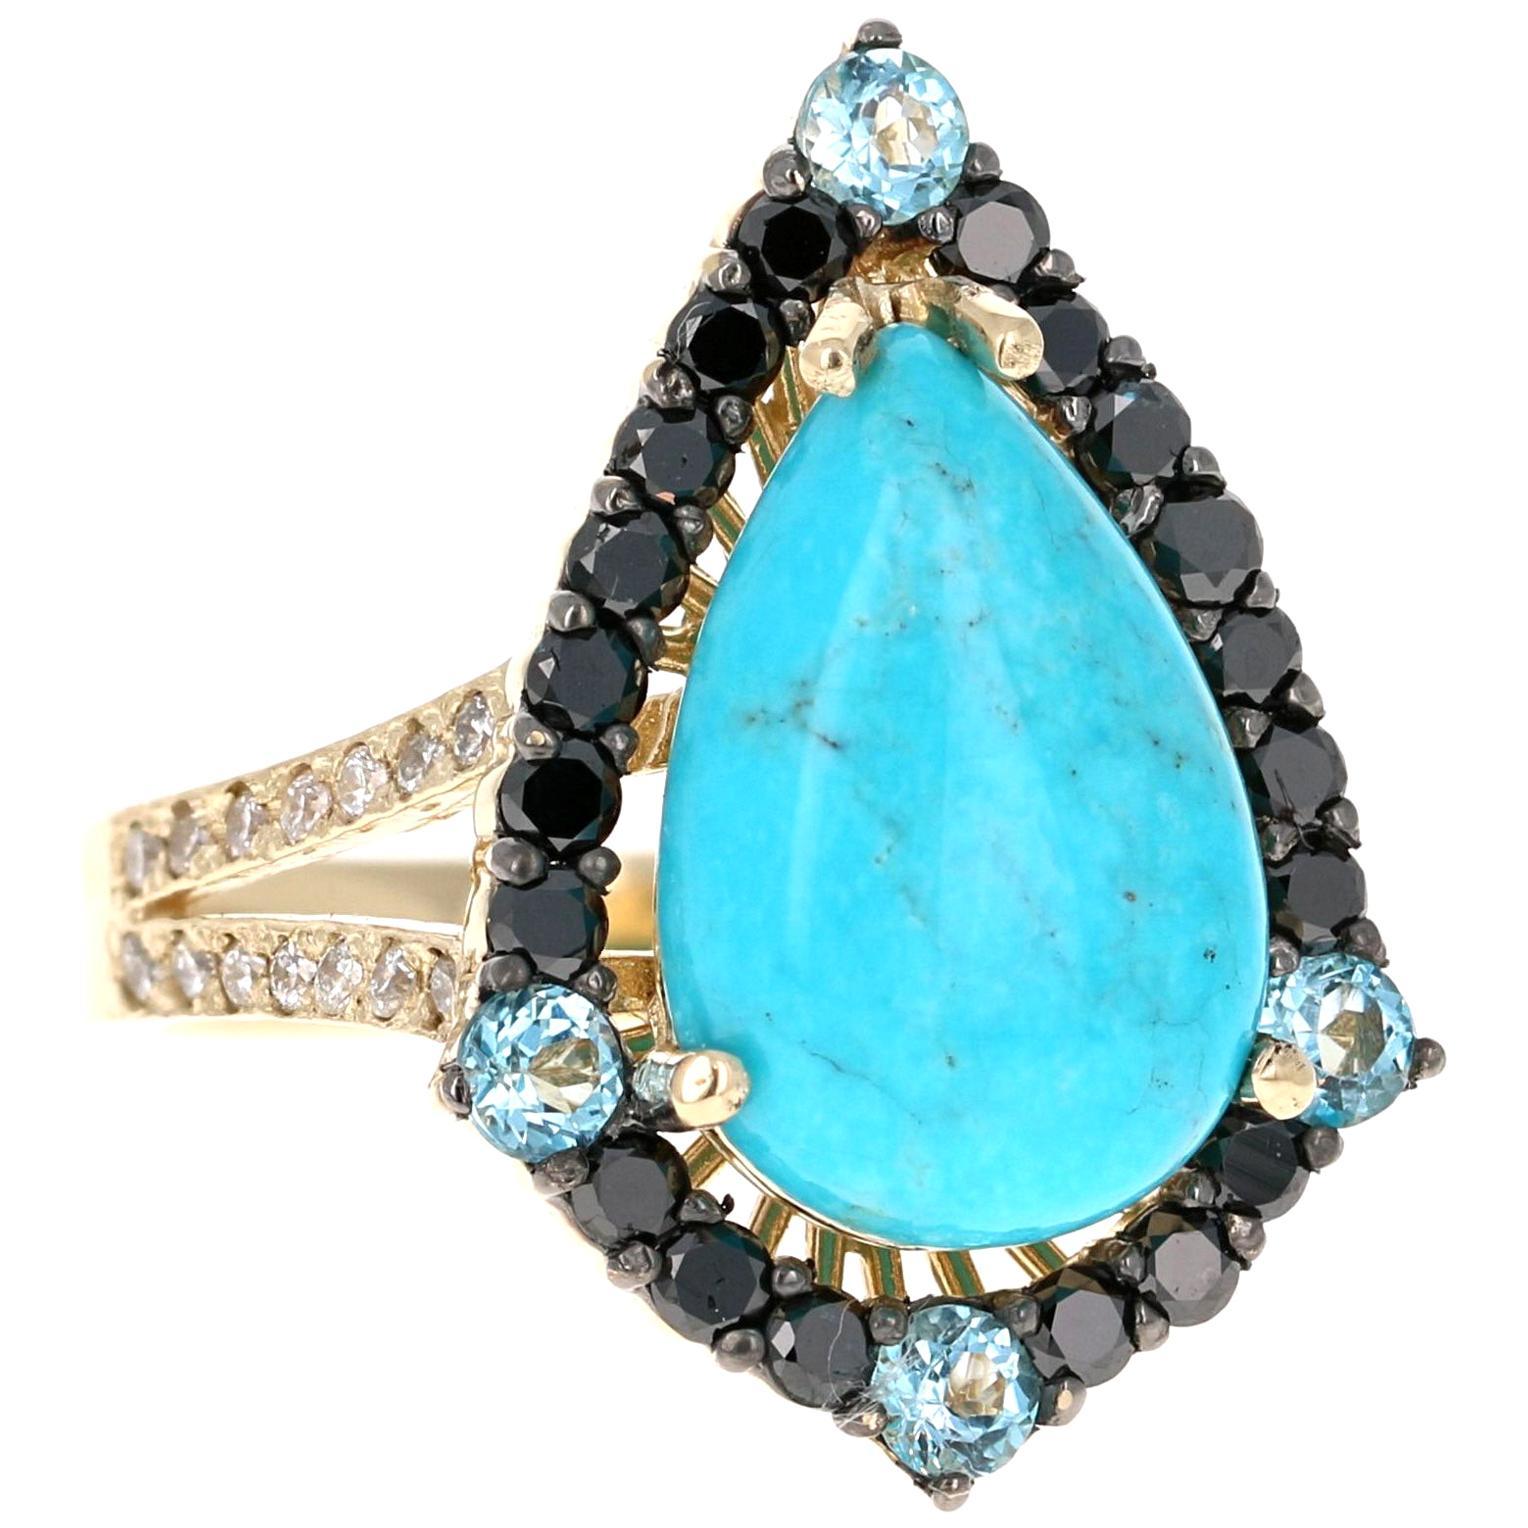 5.82 Carat Pear Cut Turquoise Topaz Black Diamond 14K Yellow Gold Bridal Ring